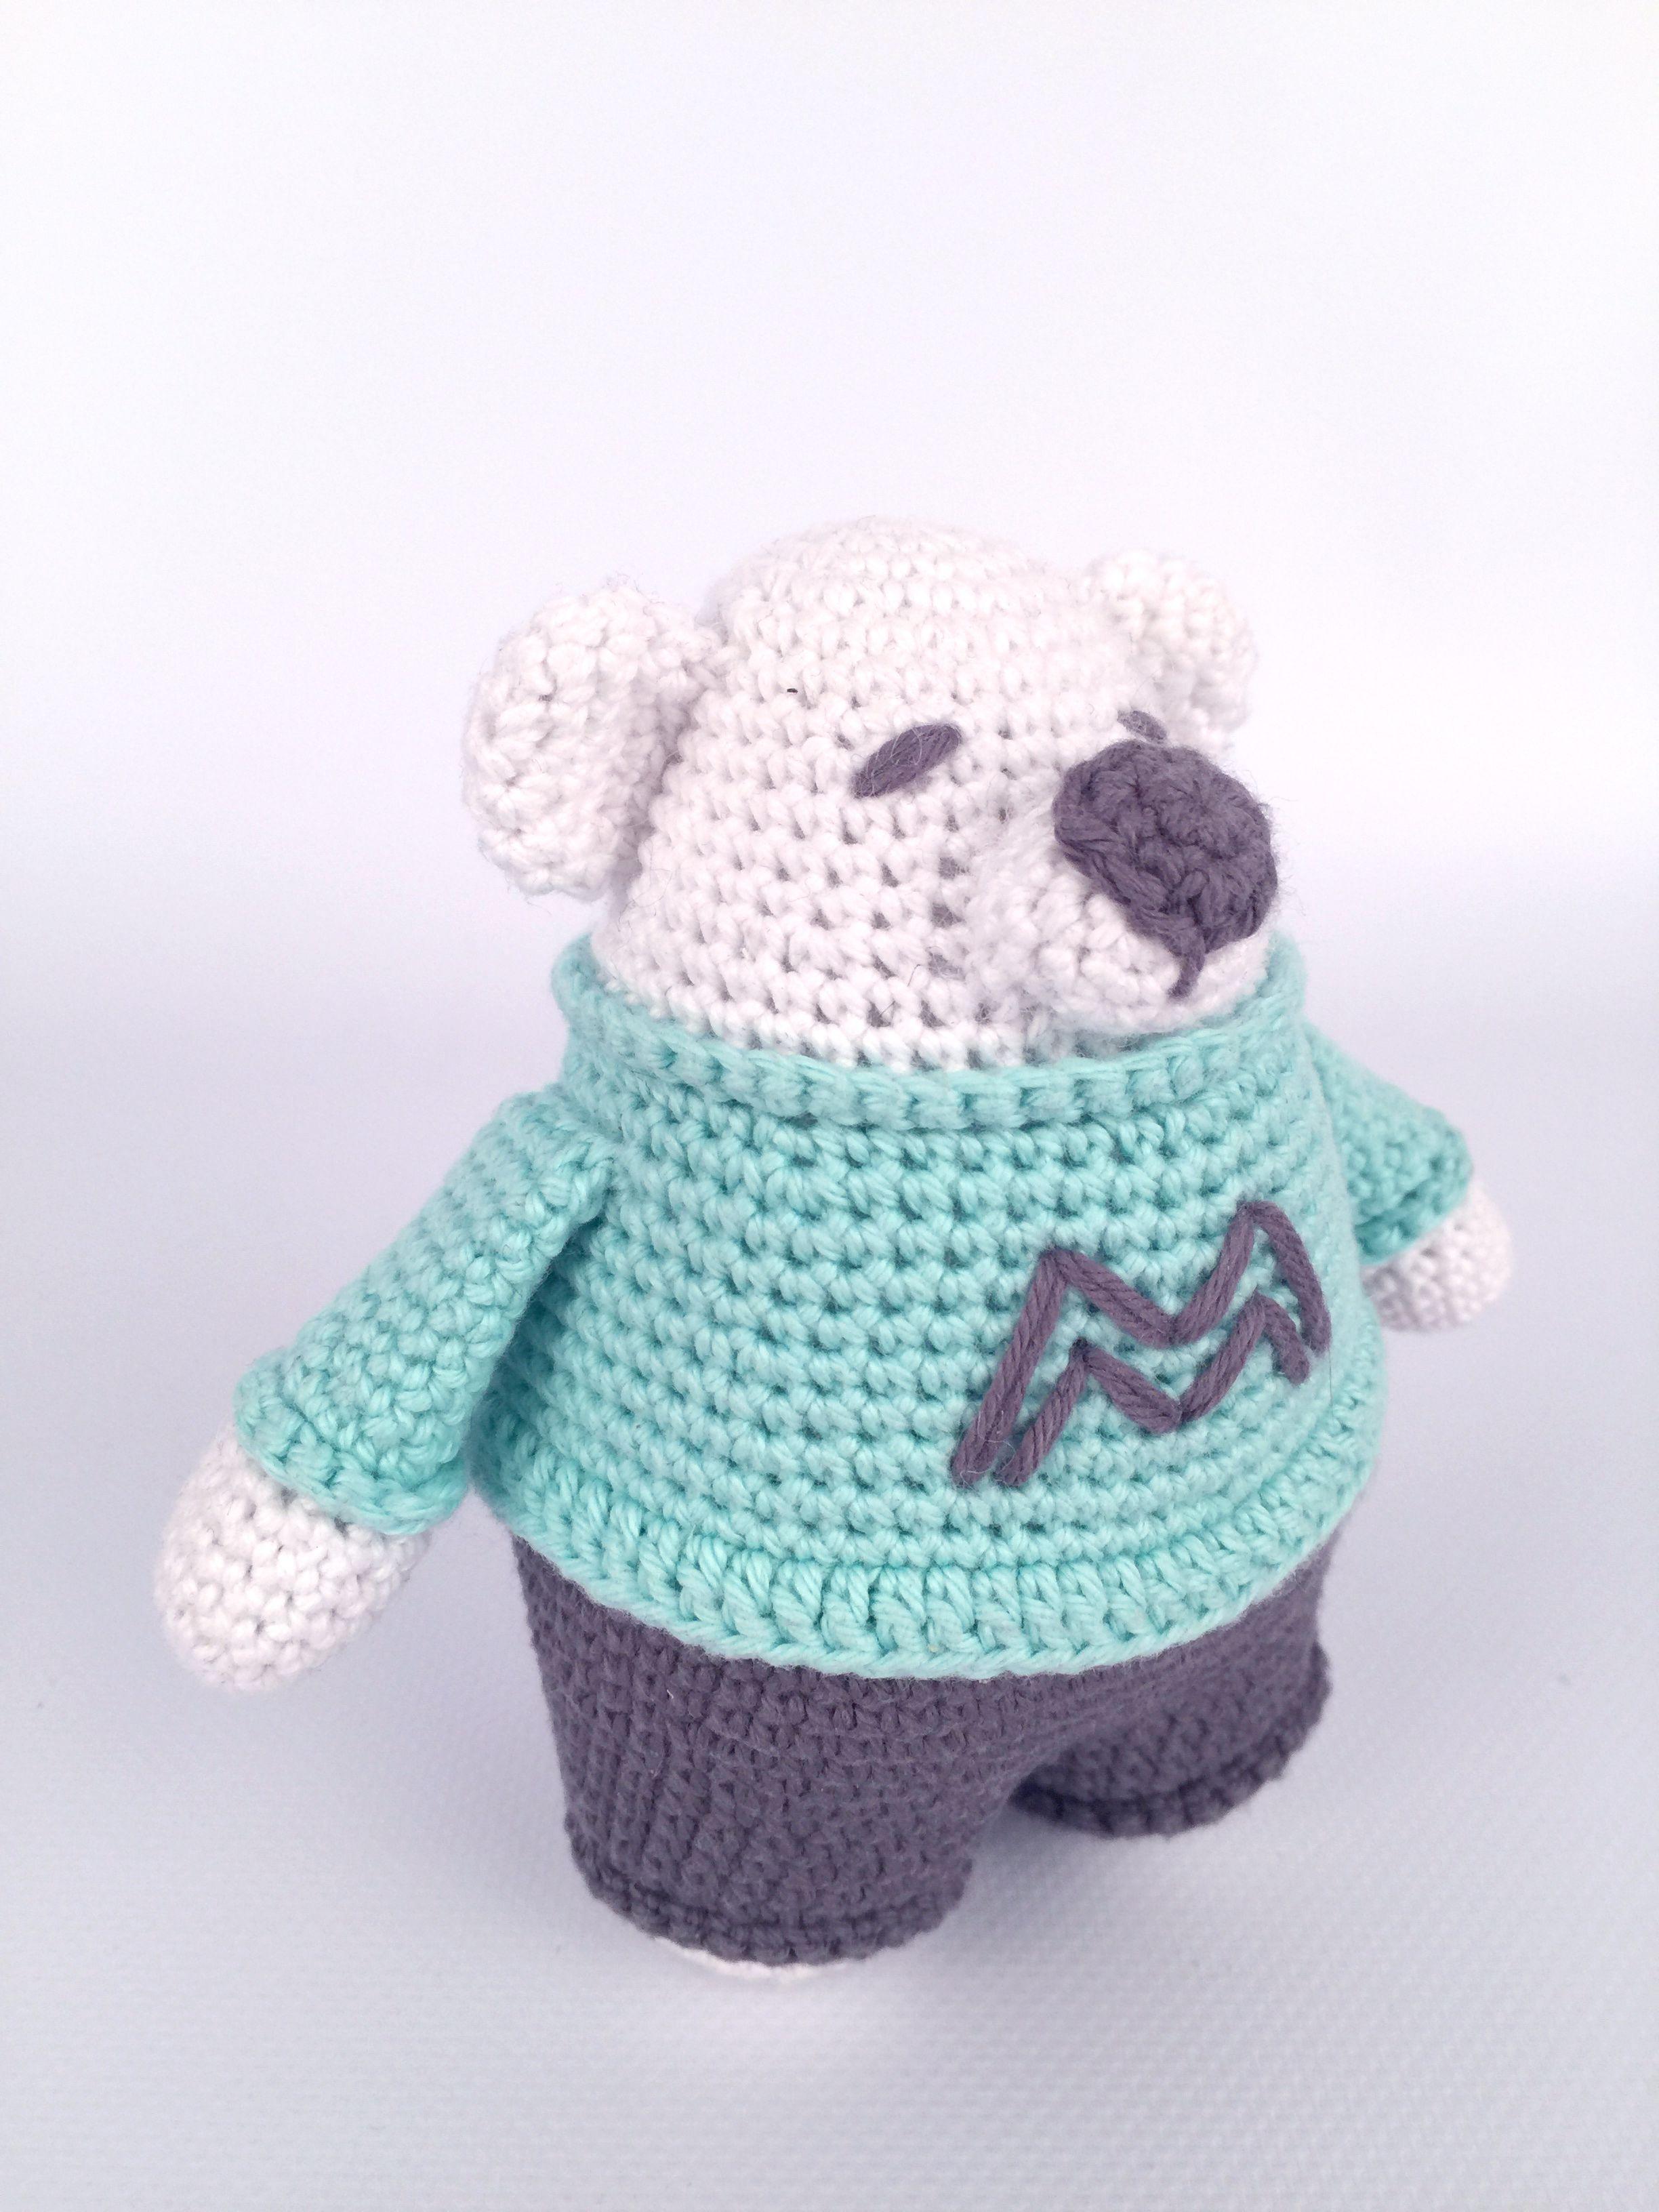 Mighty Malcolm - Free pattern by Dendennis | Crochet - den Dennis ...